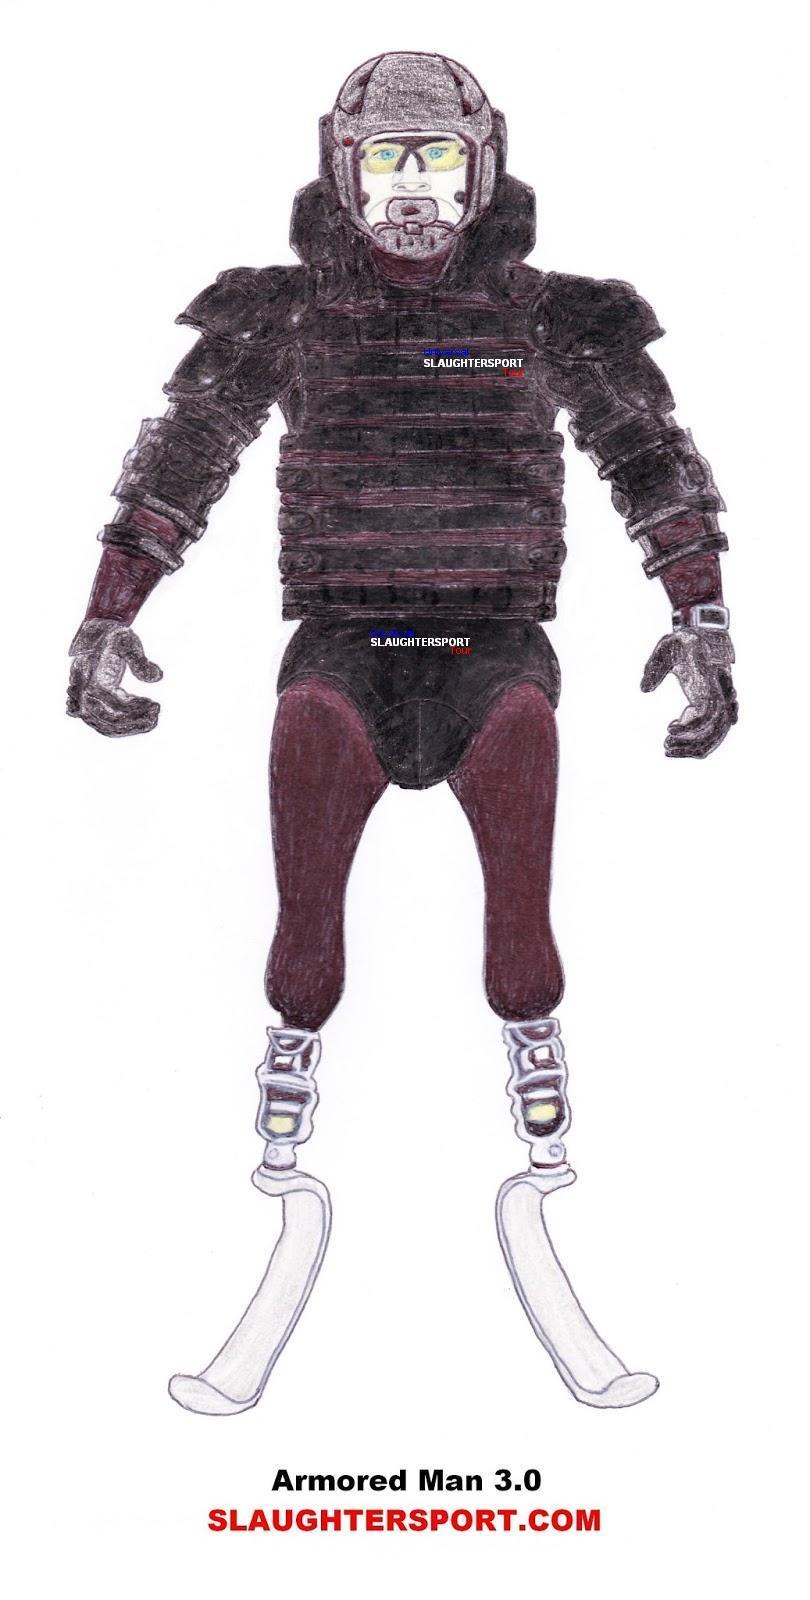 Armored Man 3.0 SLAUGHTERSPORT.COM